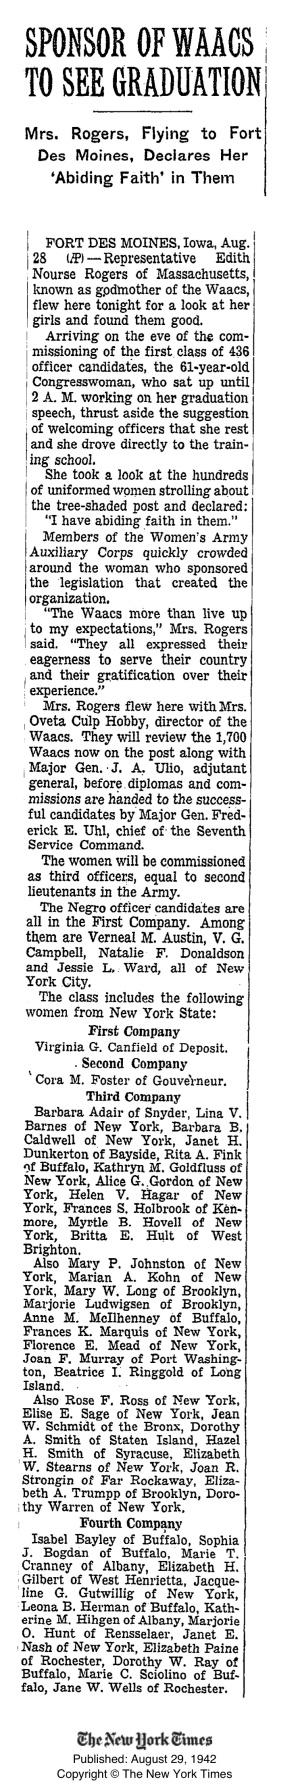 1942_EdithNourseRogers_WAACsGodmother_NYT85583747